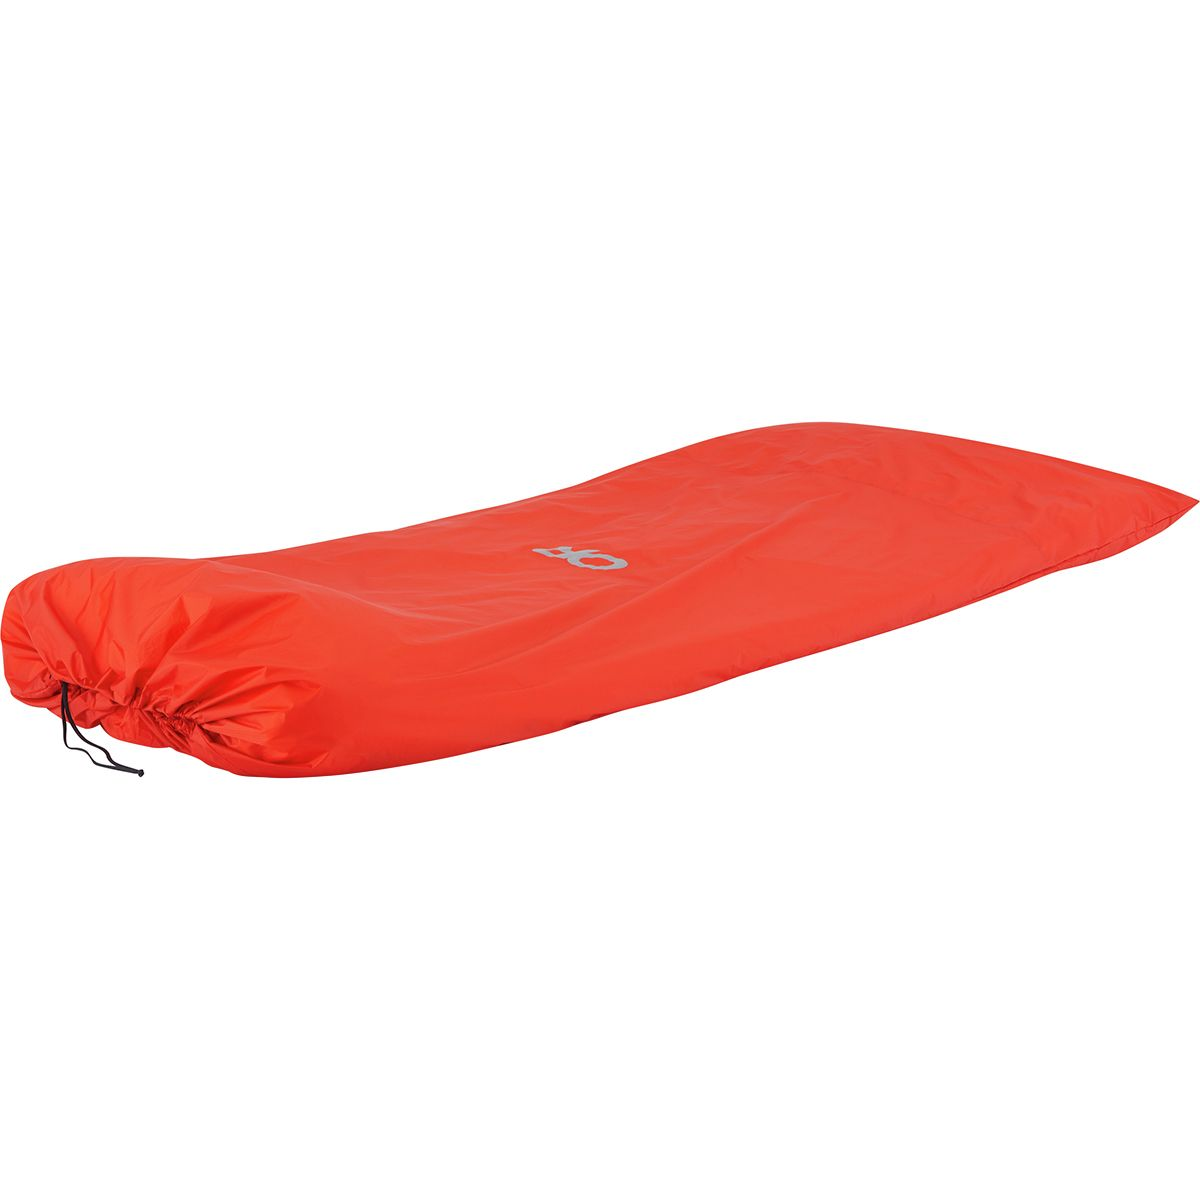 Outdoor Research Helium Emergency Bivy